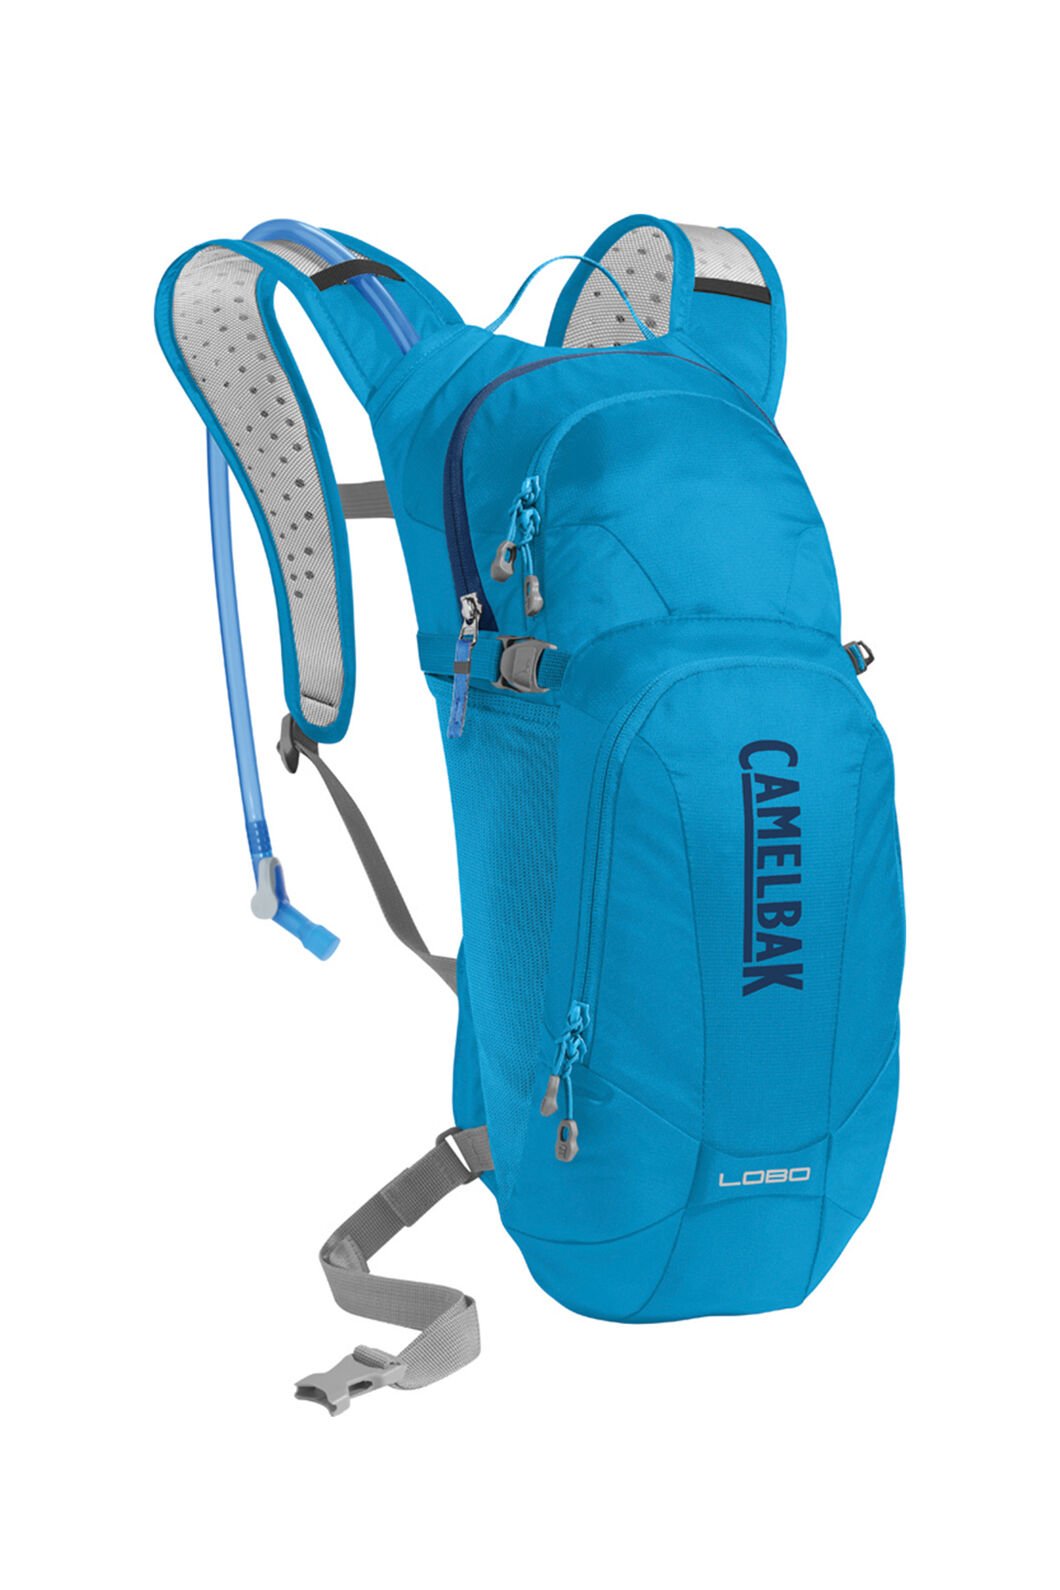 CamelBak Lobo Hydration Pack 3L AtomicL, ATOMIC BLUE, hi-res